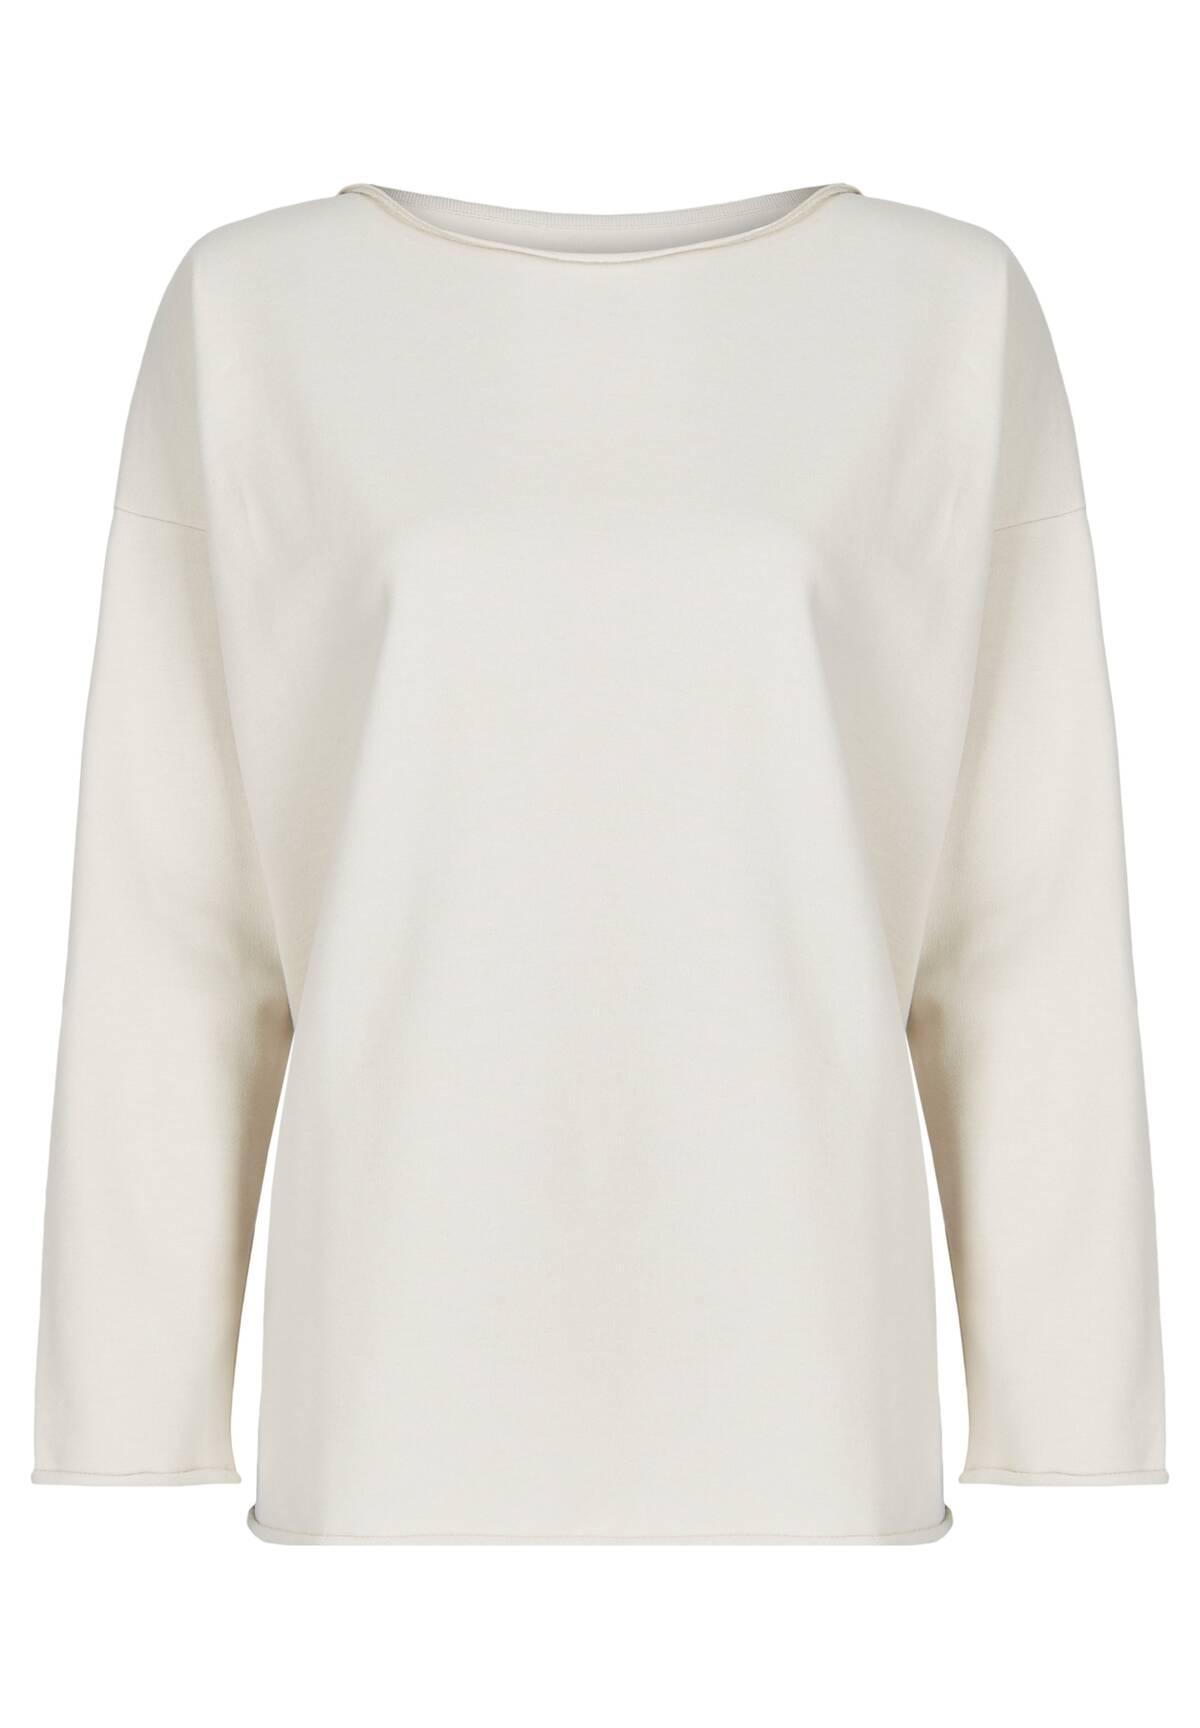 Sportives Shirt / Casual Sweatshirt